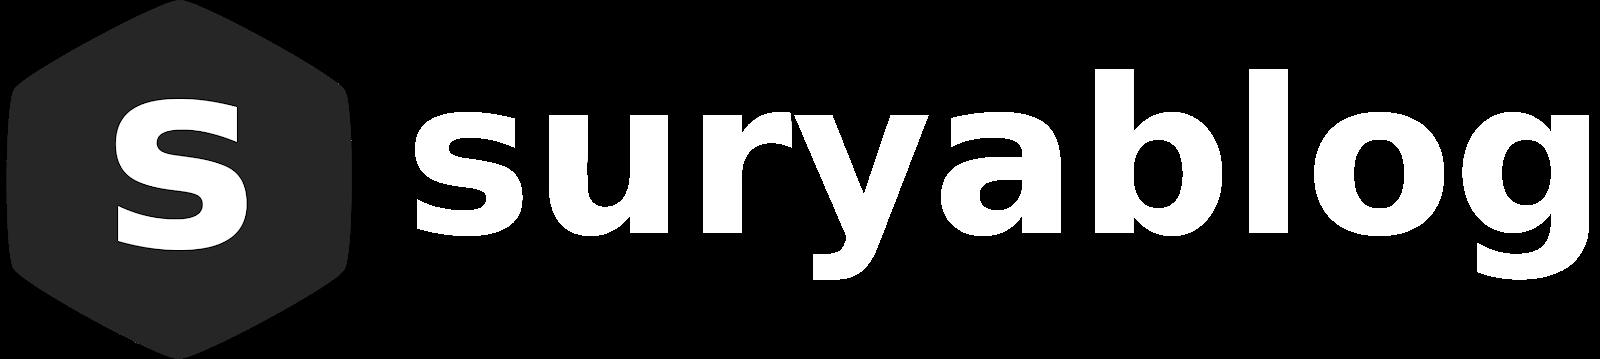 suryablog